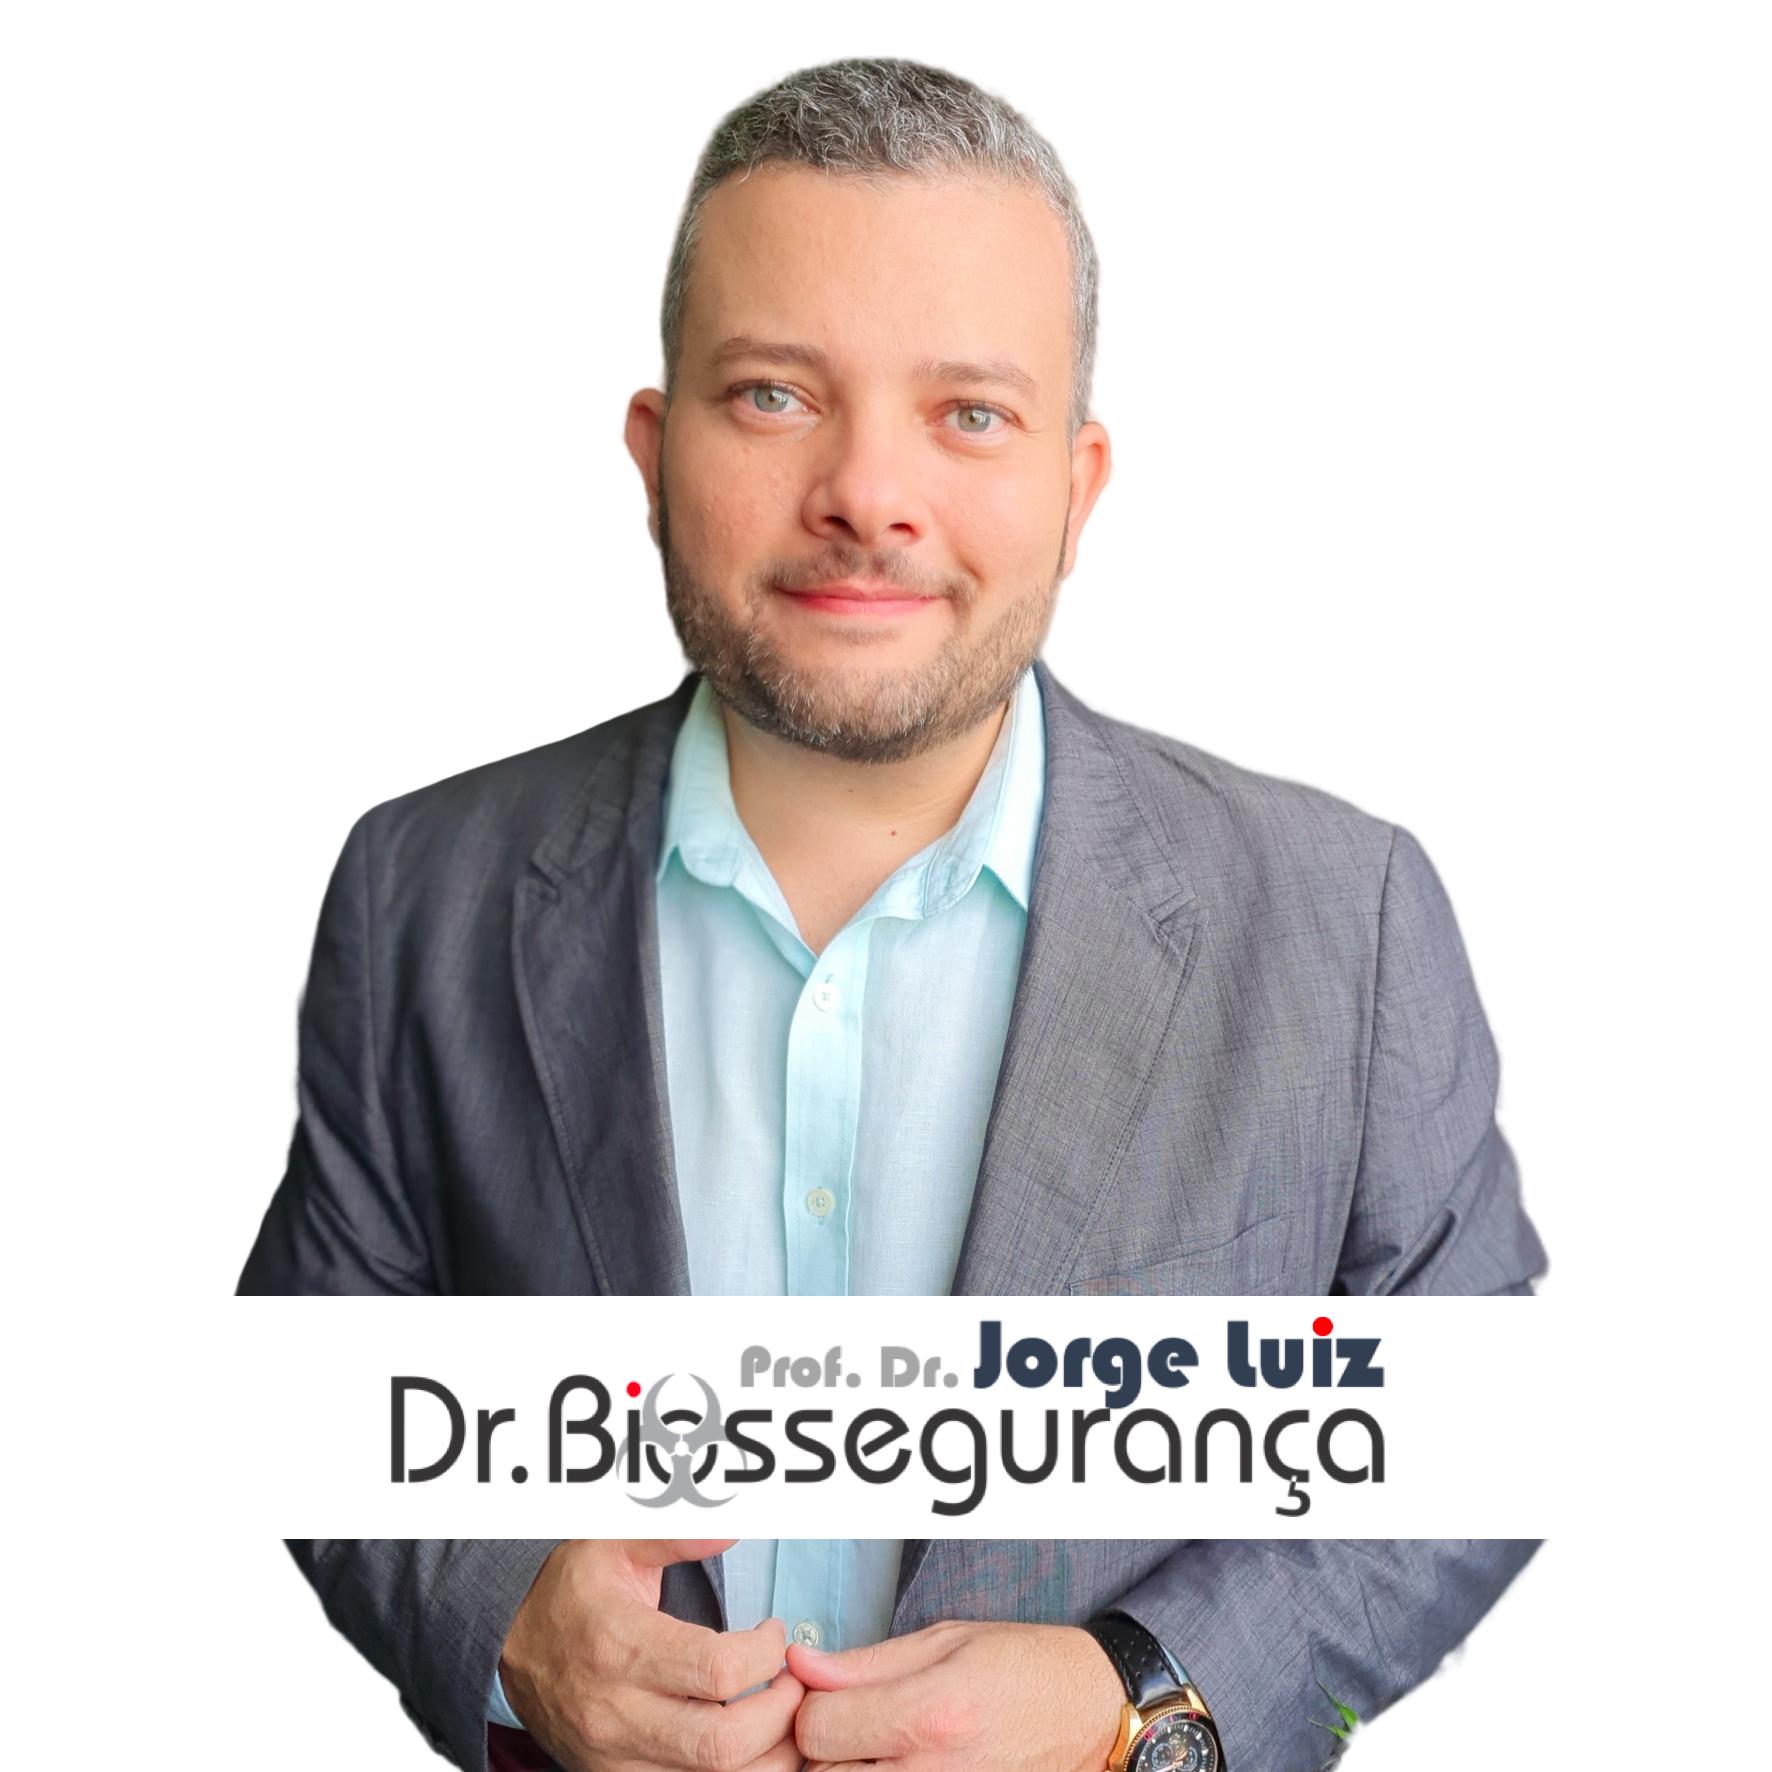 @dr.biosseguranca Profile Image | Linktree